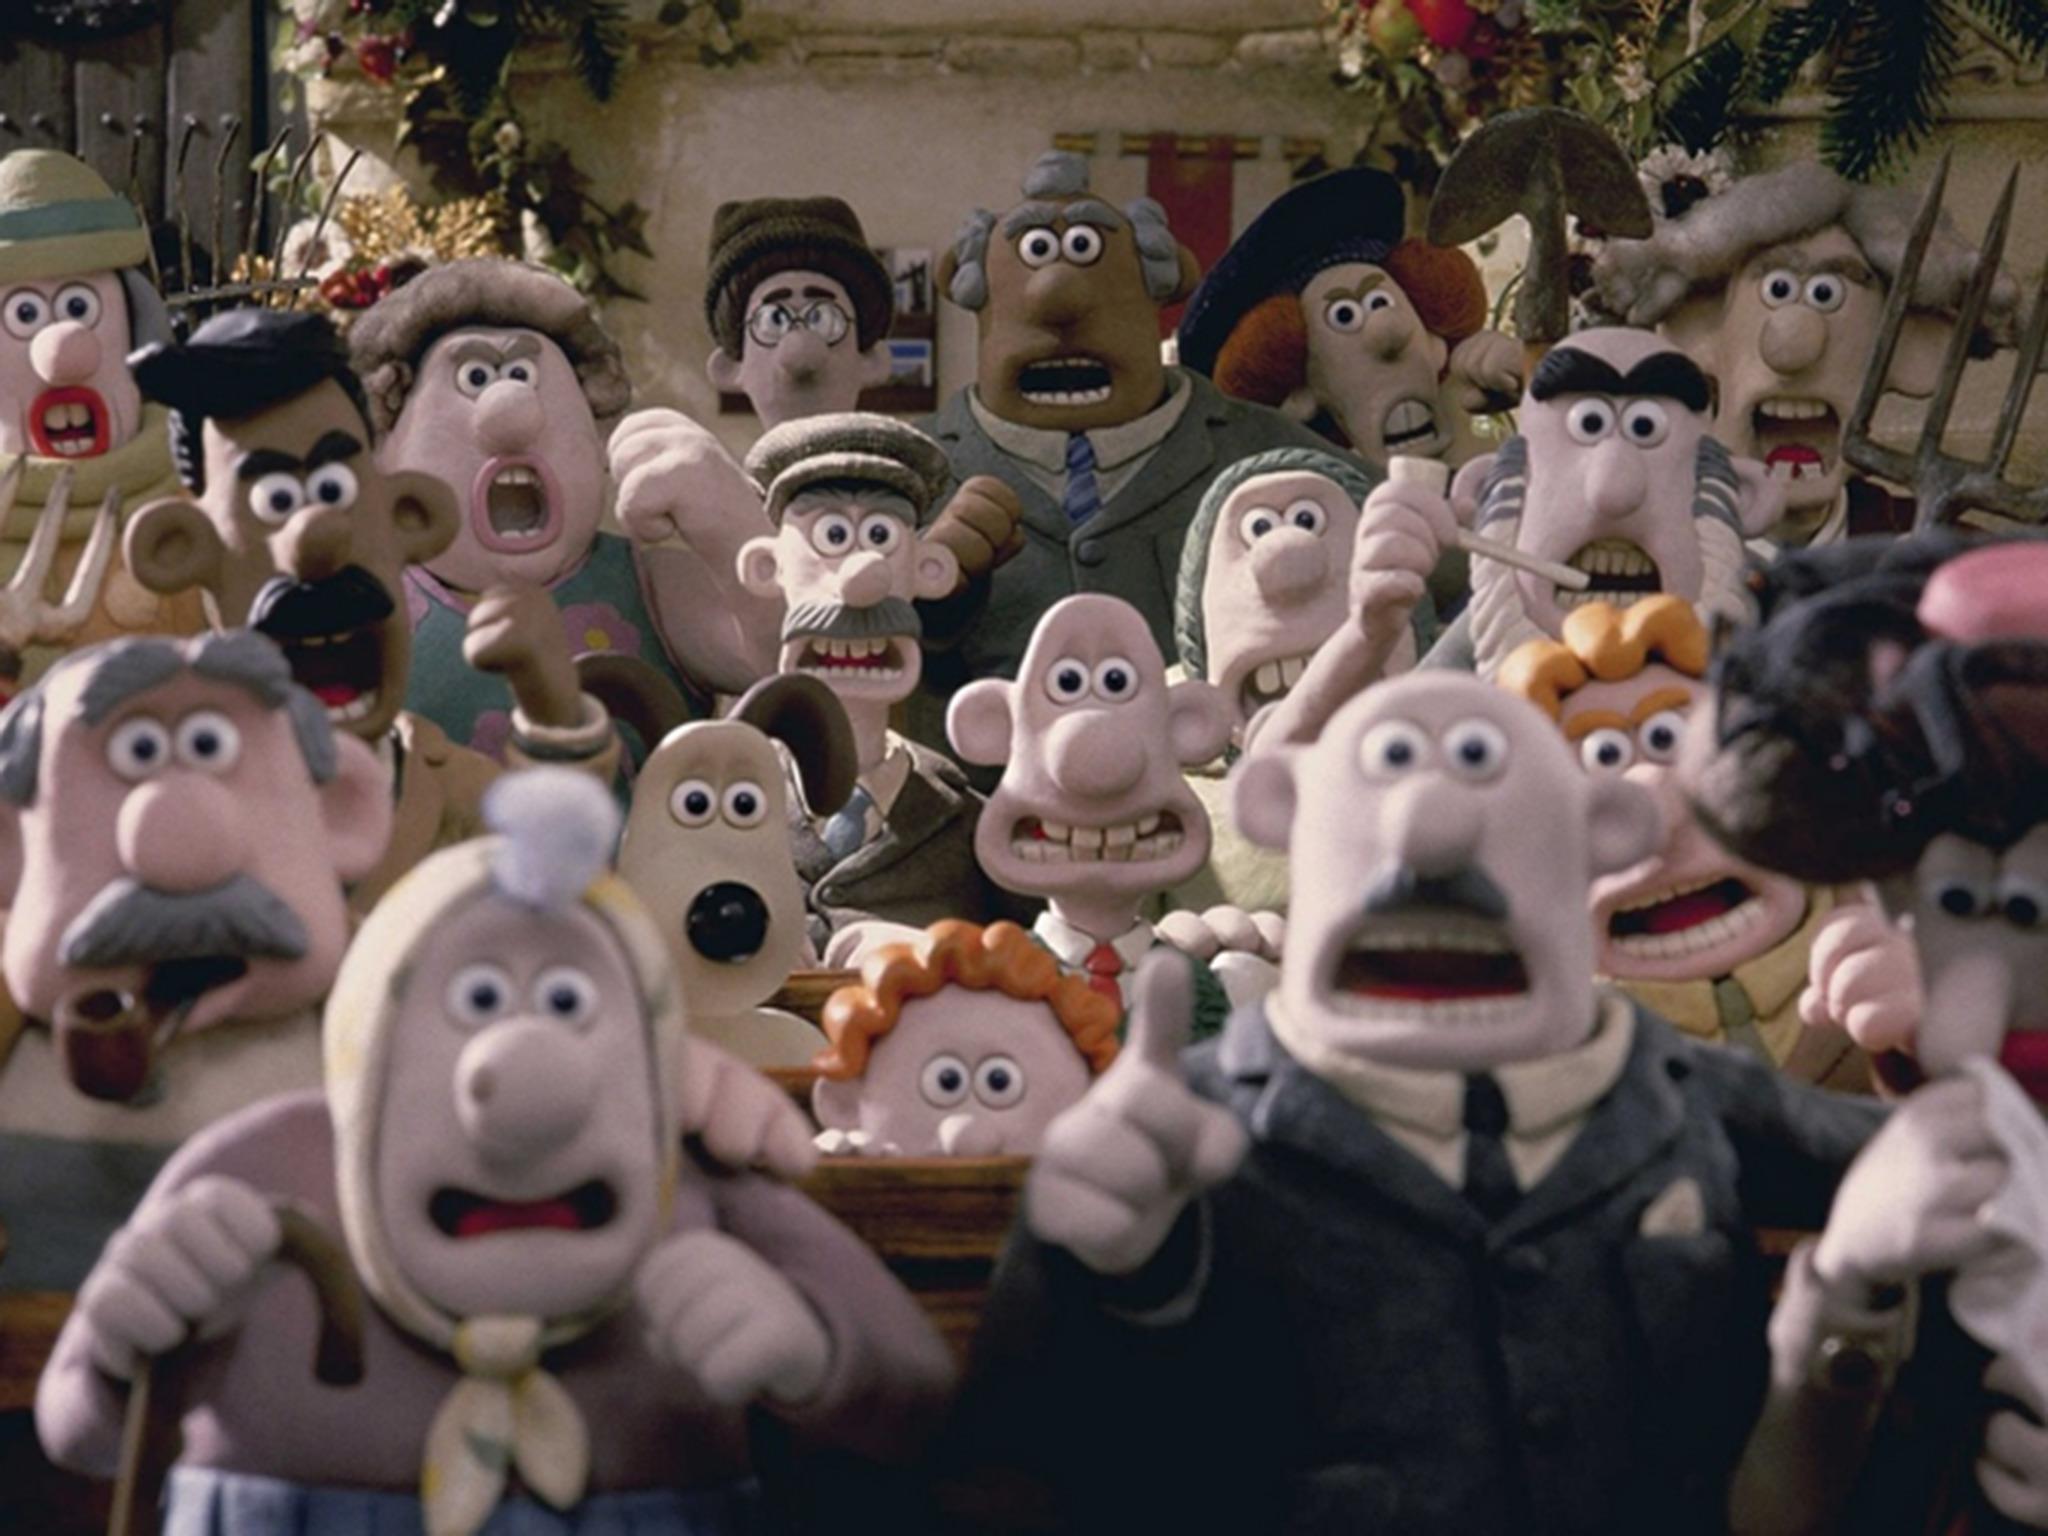 Best kids movies on Netflix - Wallace & Gromit, Curse of the Were-Rabbit